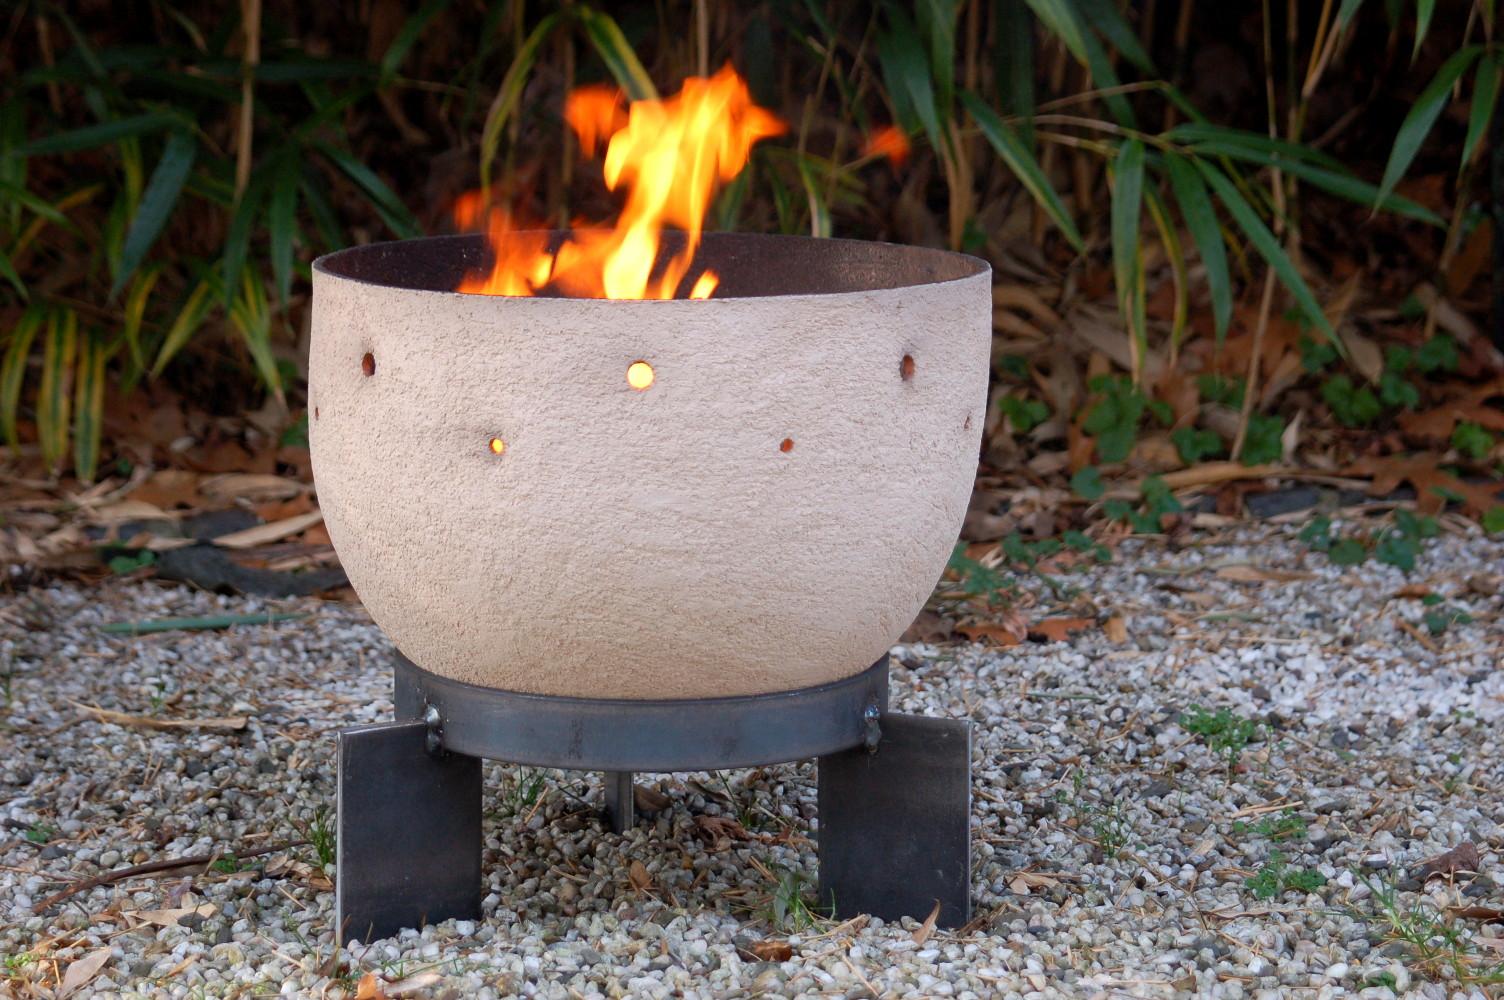 feuerschale hekla seebach keramik. Black Bedroom Furniture Sets. Home Design Ideas